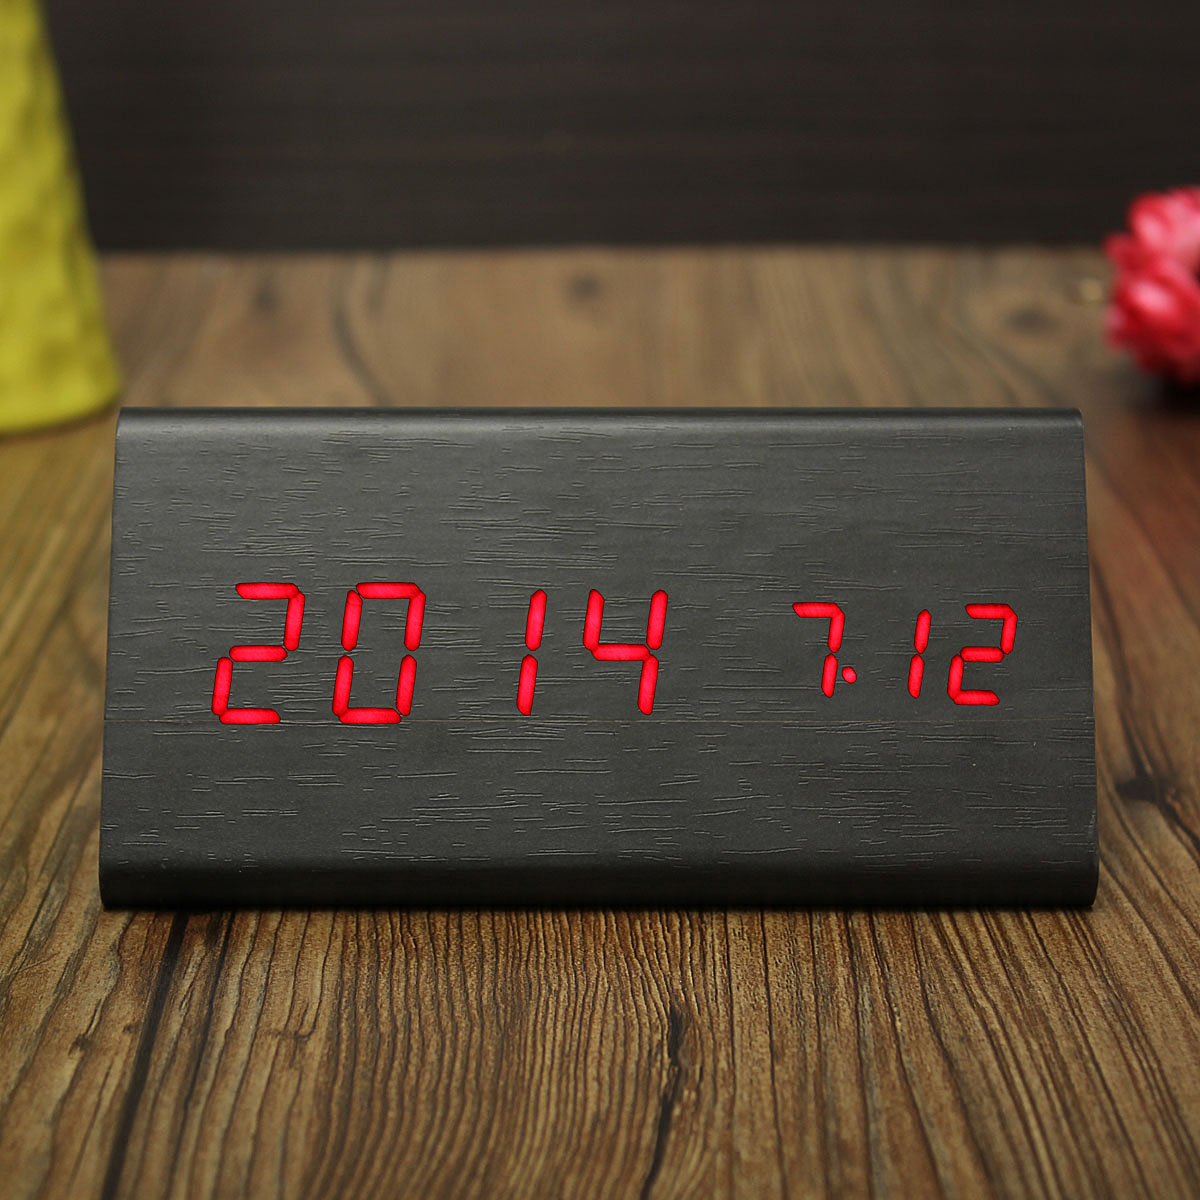 LED часы-сувенир бомба на arduino своими руками